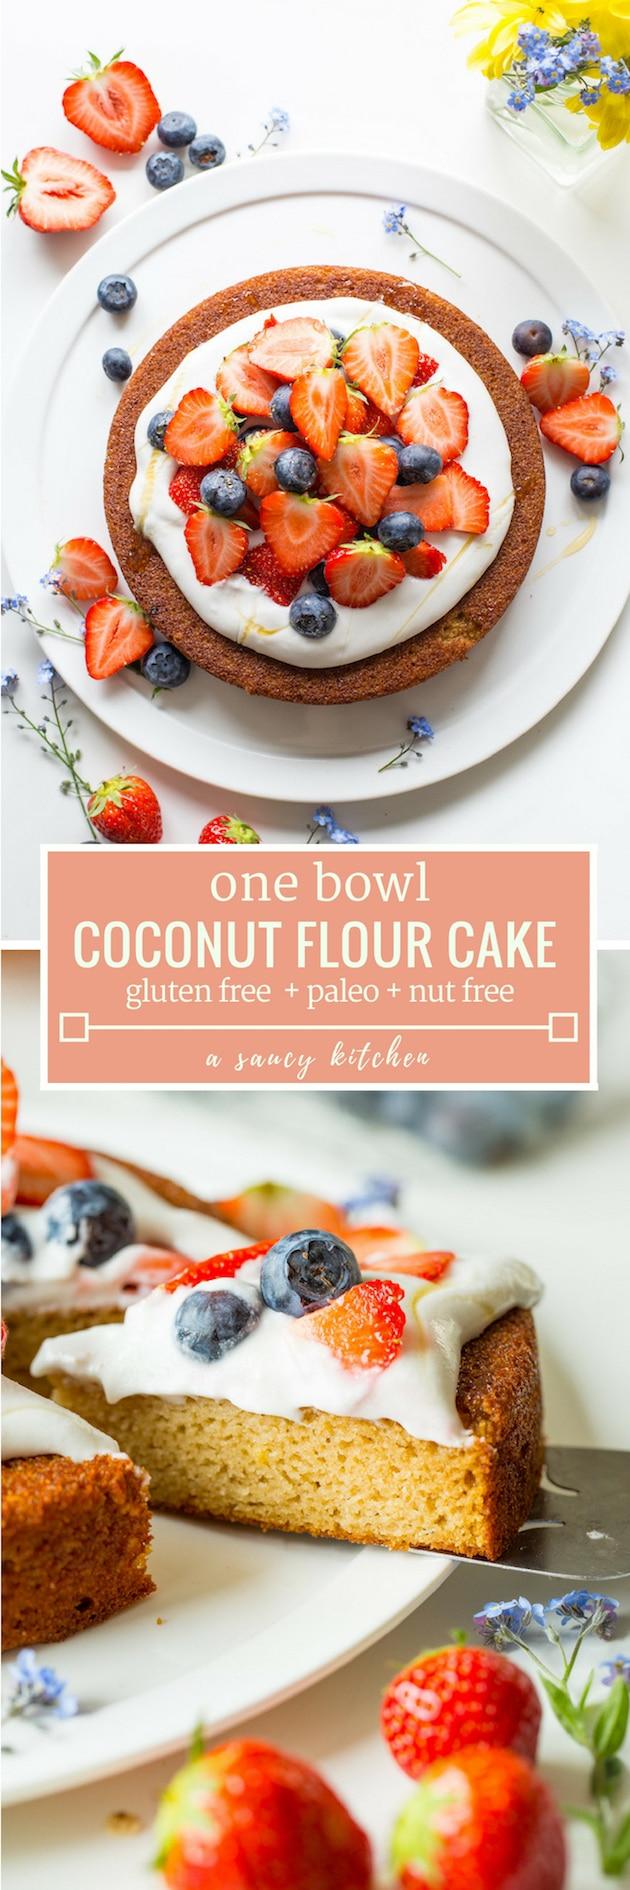 coconut flour cake pin graphic